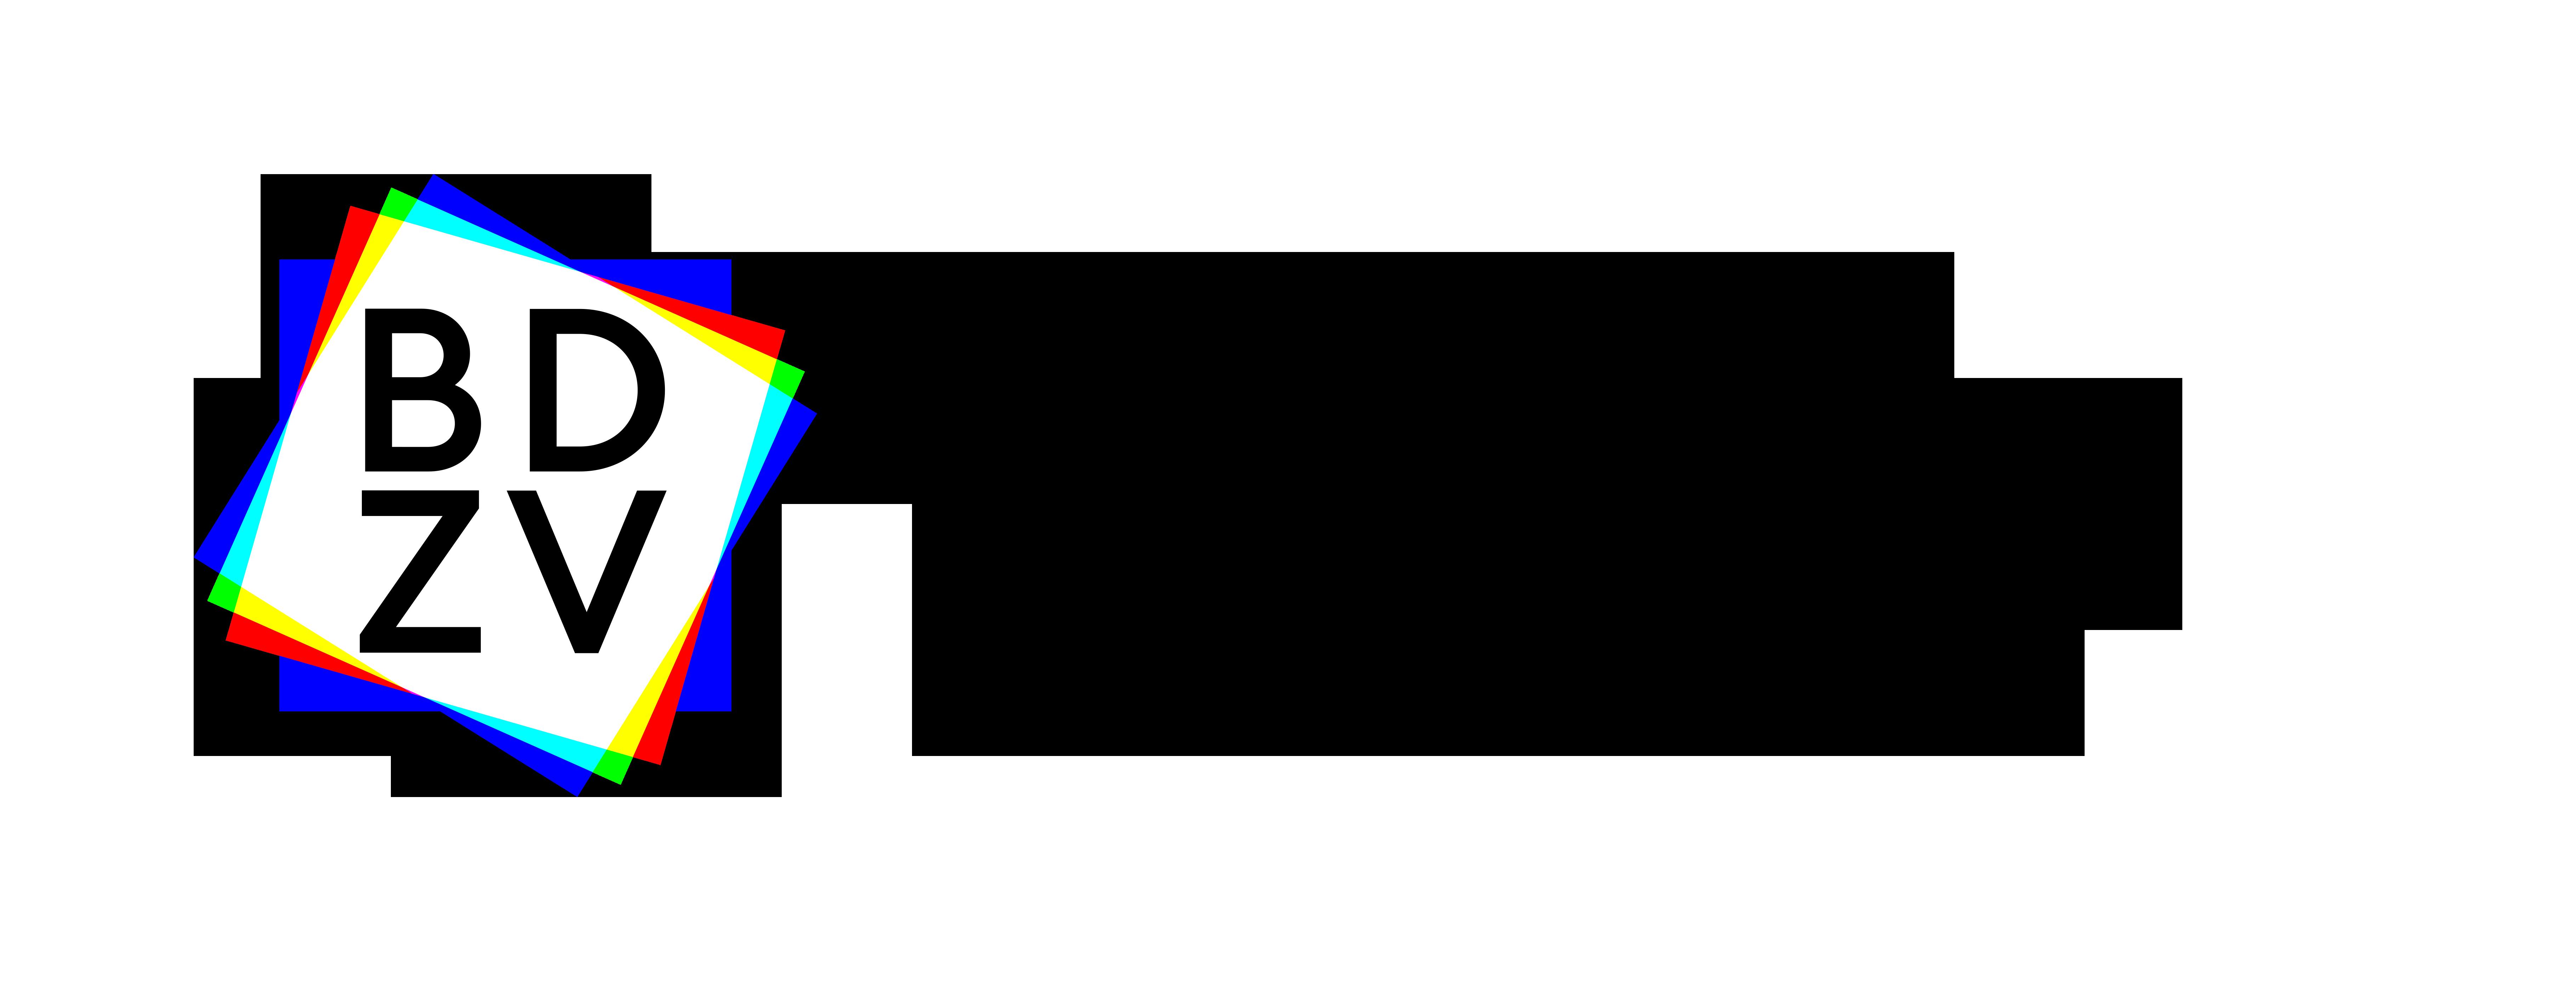 BDZV Logo Digital